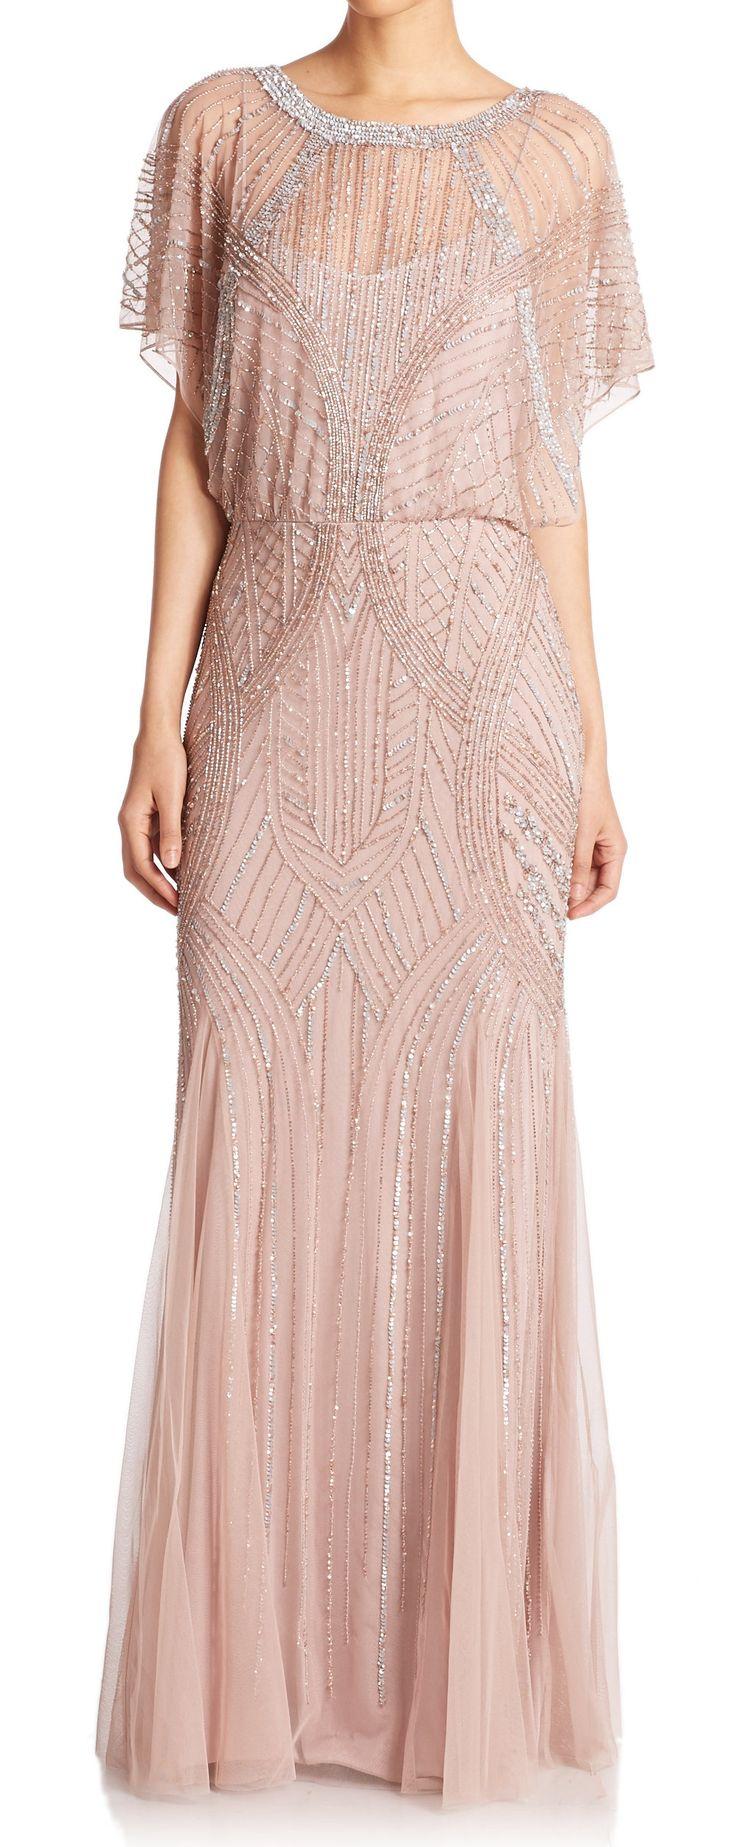 Blush beaded gown #artdeco #20s #gatsby